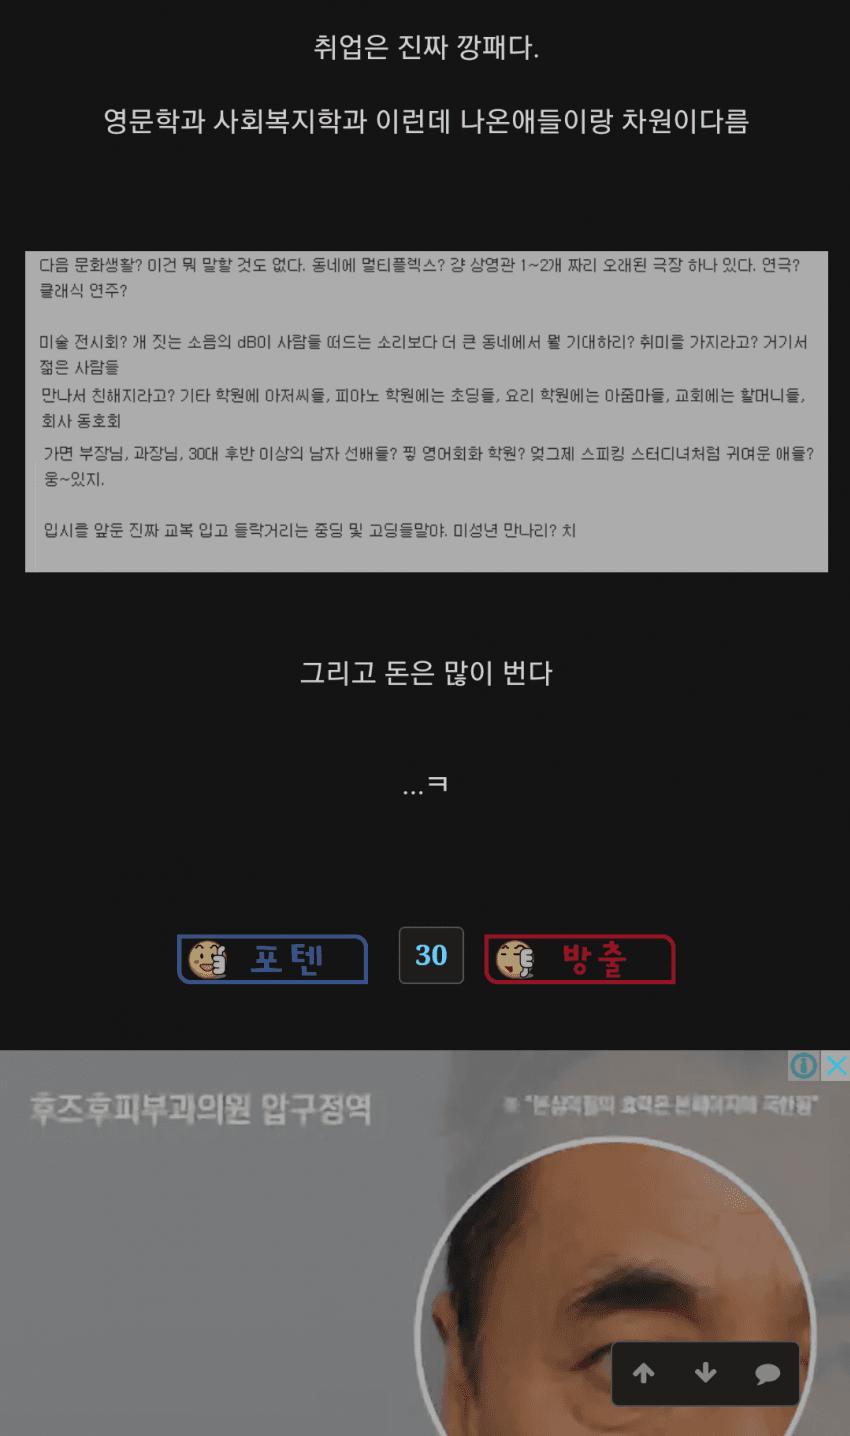 viewimage.php?no=24b0d769e1d32ca73fec8ffa11d0283194eeae3ea3f7d0da351cf9d3408070130c1a73e7958e9aea47457f0b2a97251e88f013da8b0f56279e0ee4b9418c2b3aece119efcef968b222f571fe5326a3cbf6e3077e8a